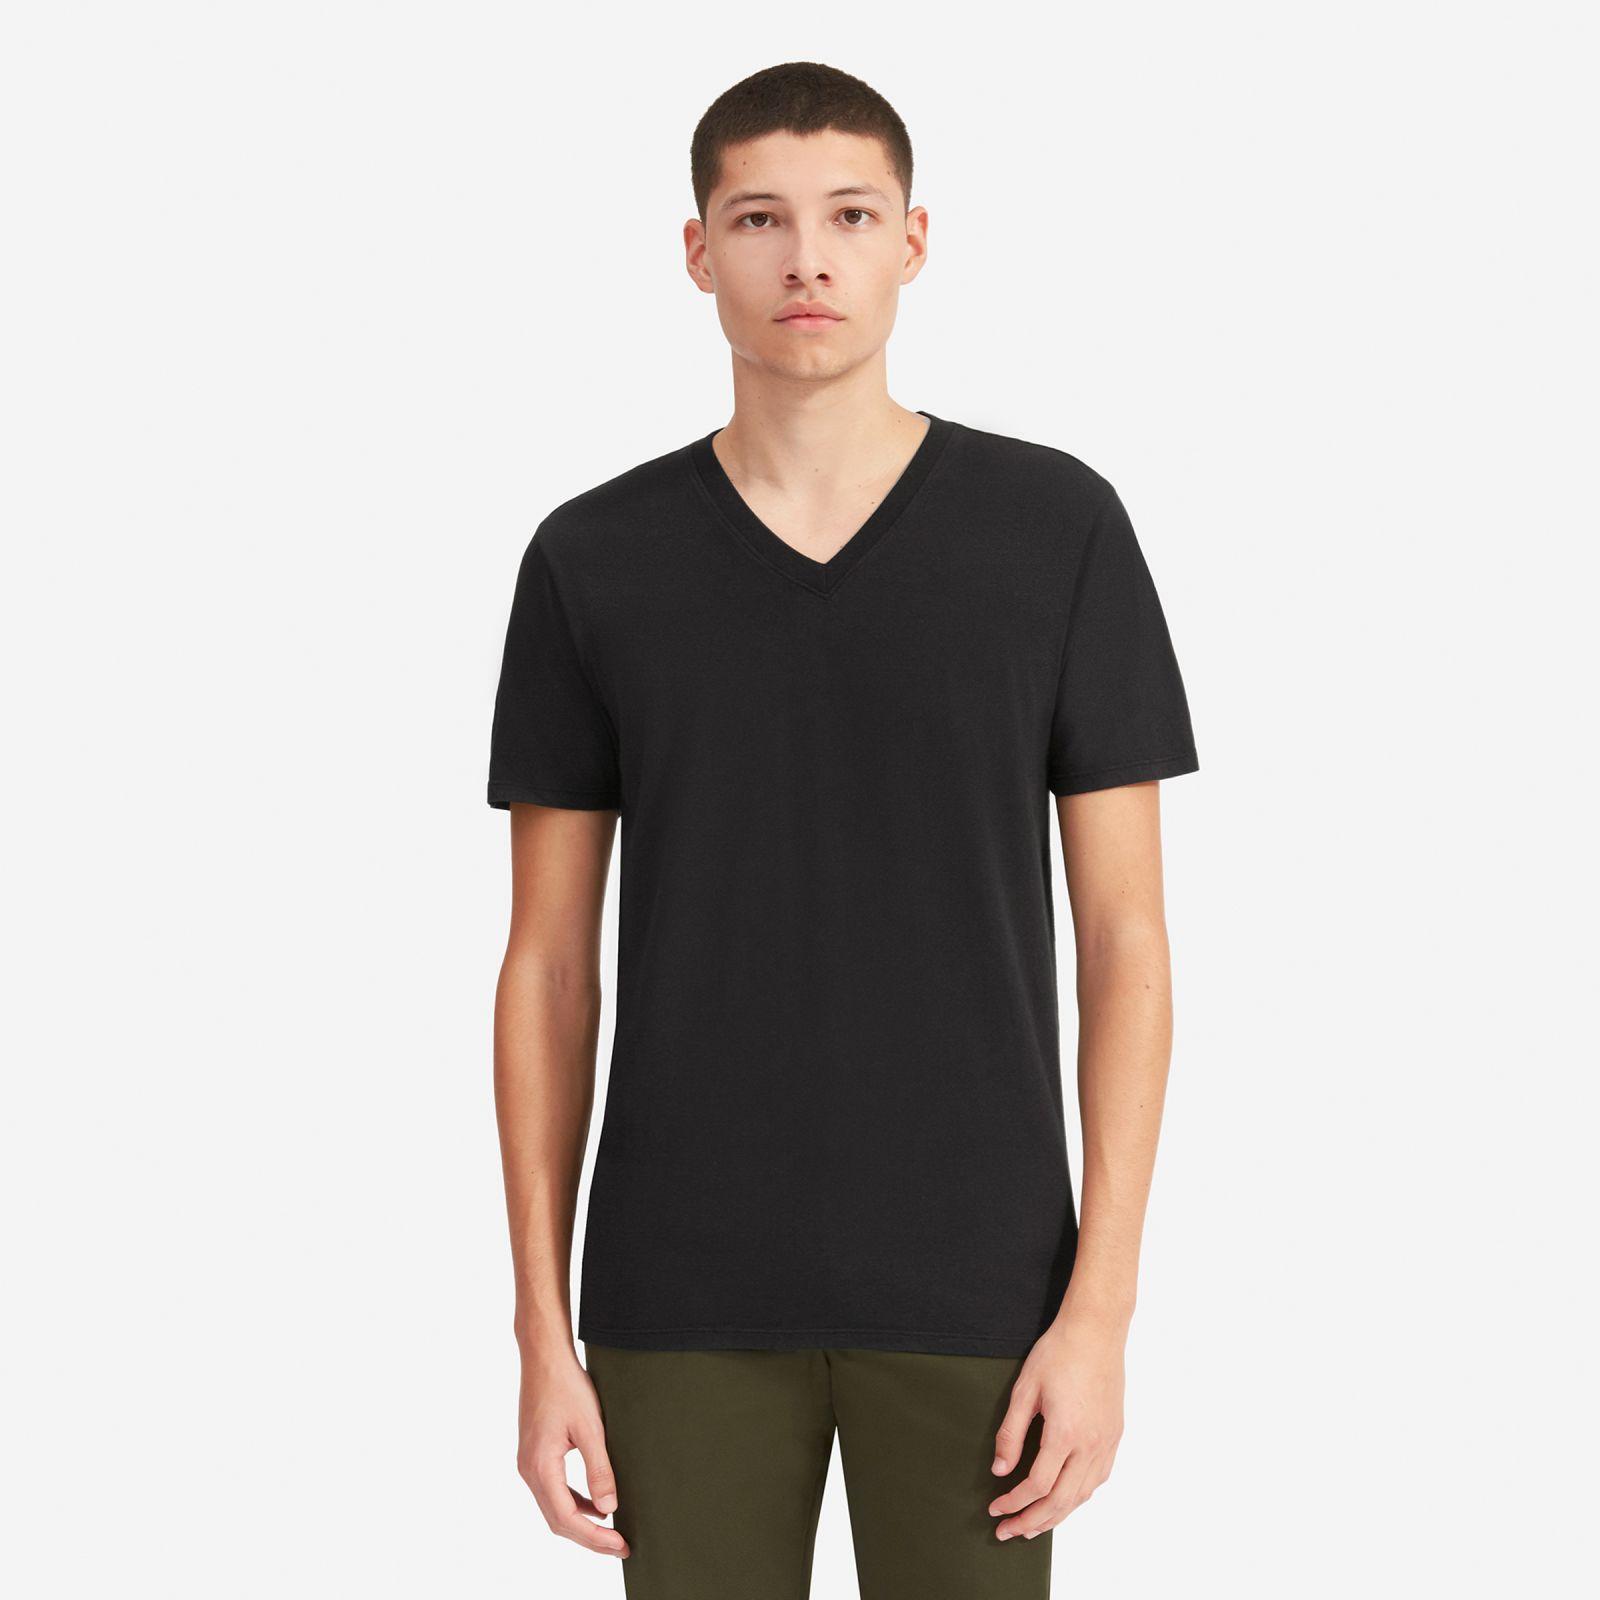 men's cotton v-neck t-shirt | uniform by everlane in true black, size xl